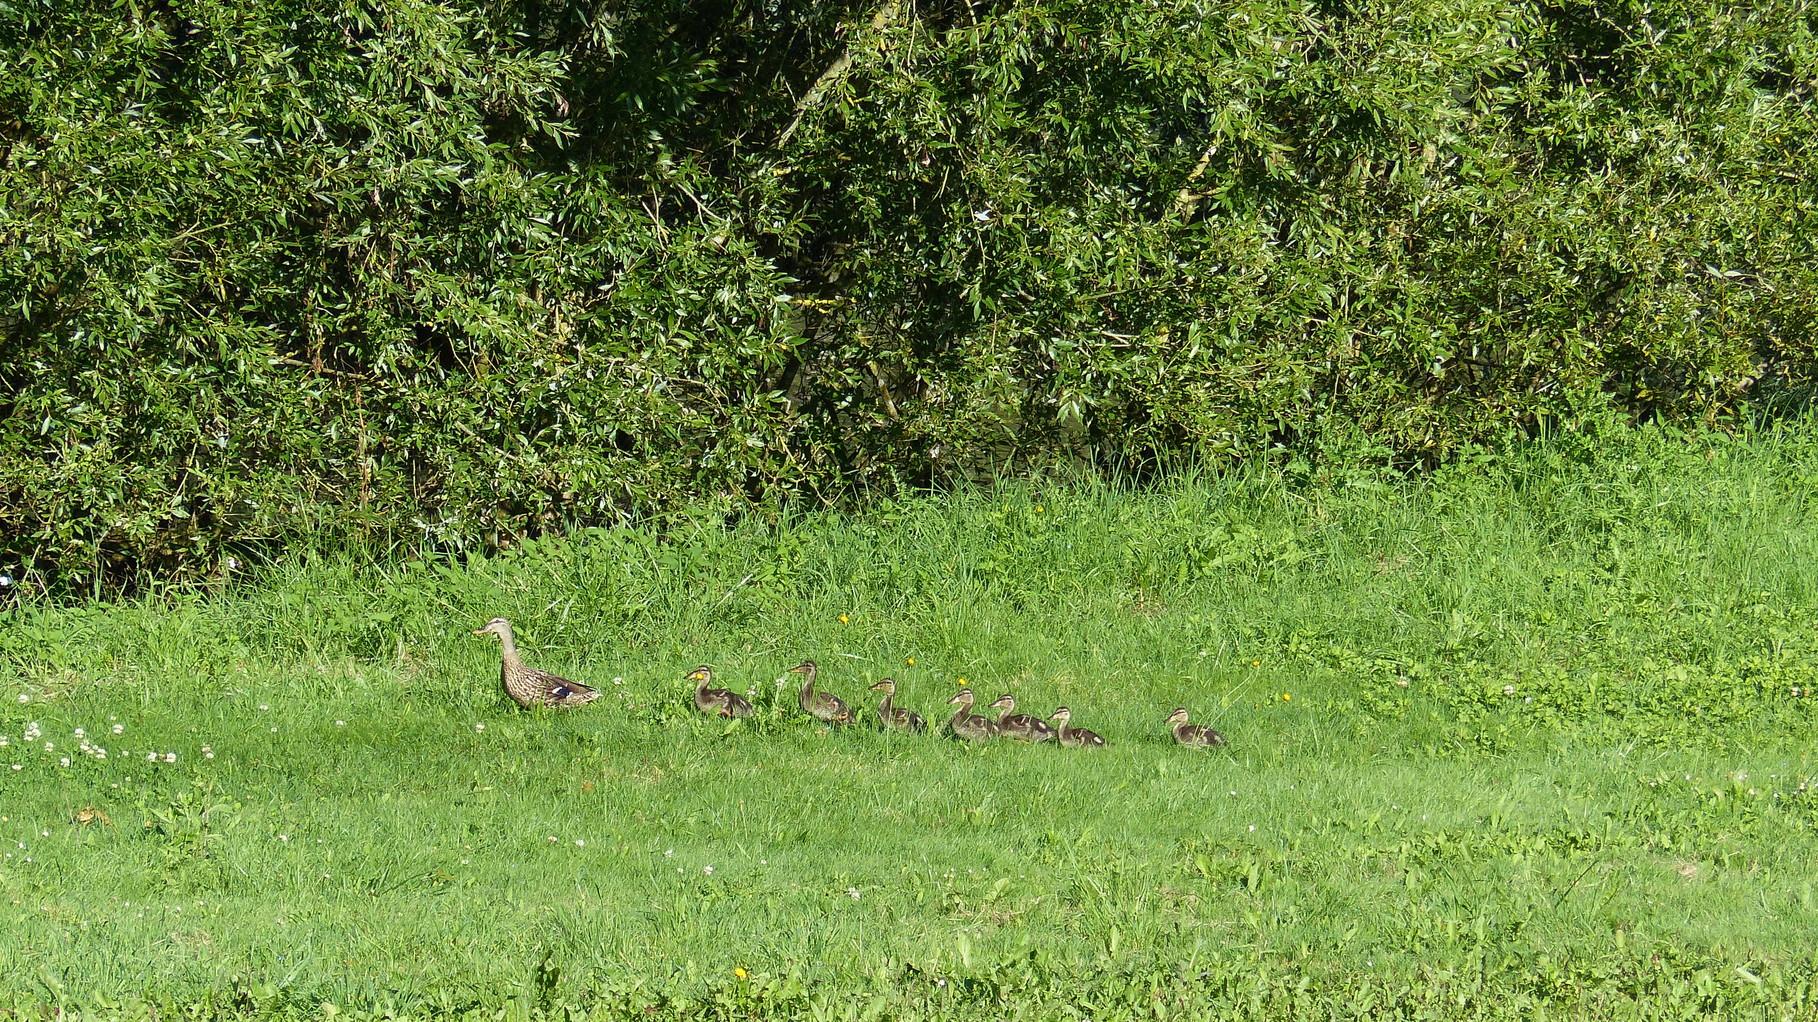 Promenade de la famille canard au bord de l'étang